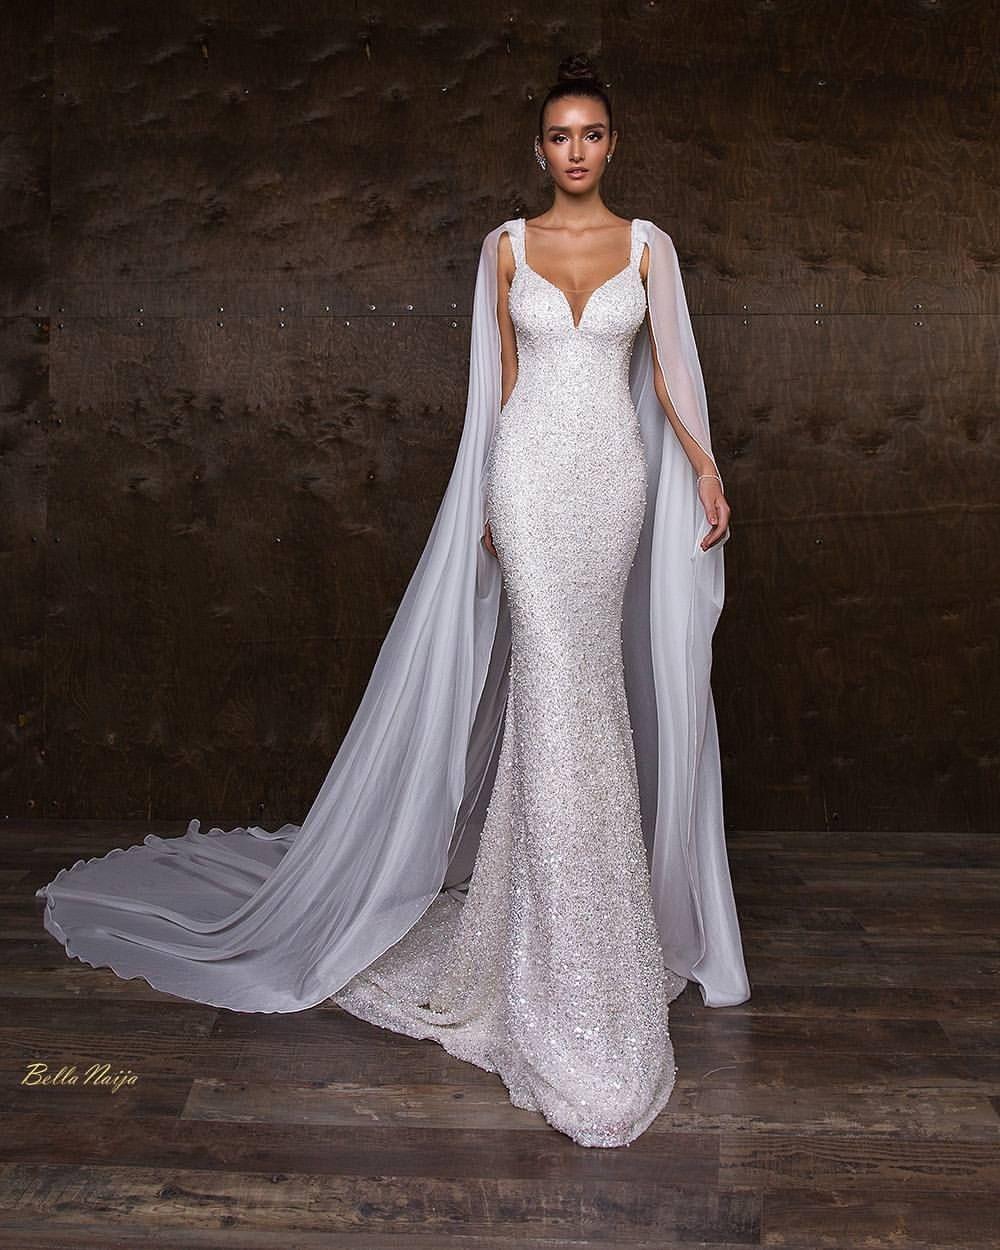 49++ Shimmer fabric wedding dress info